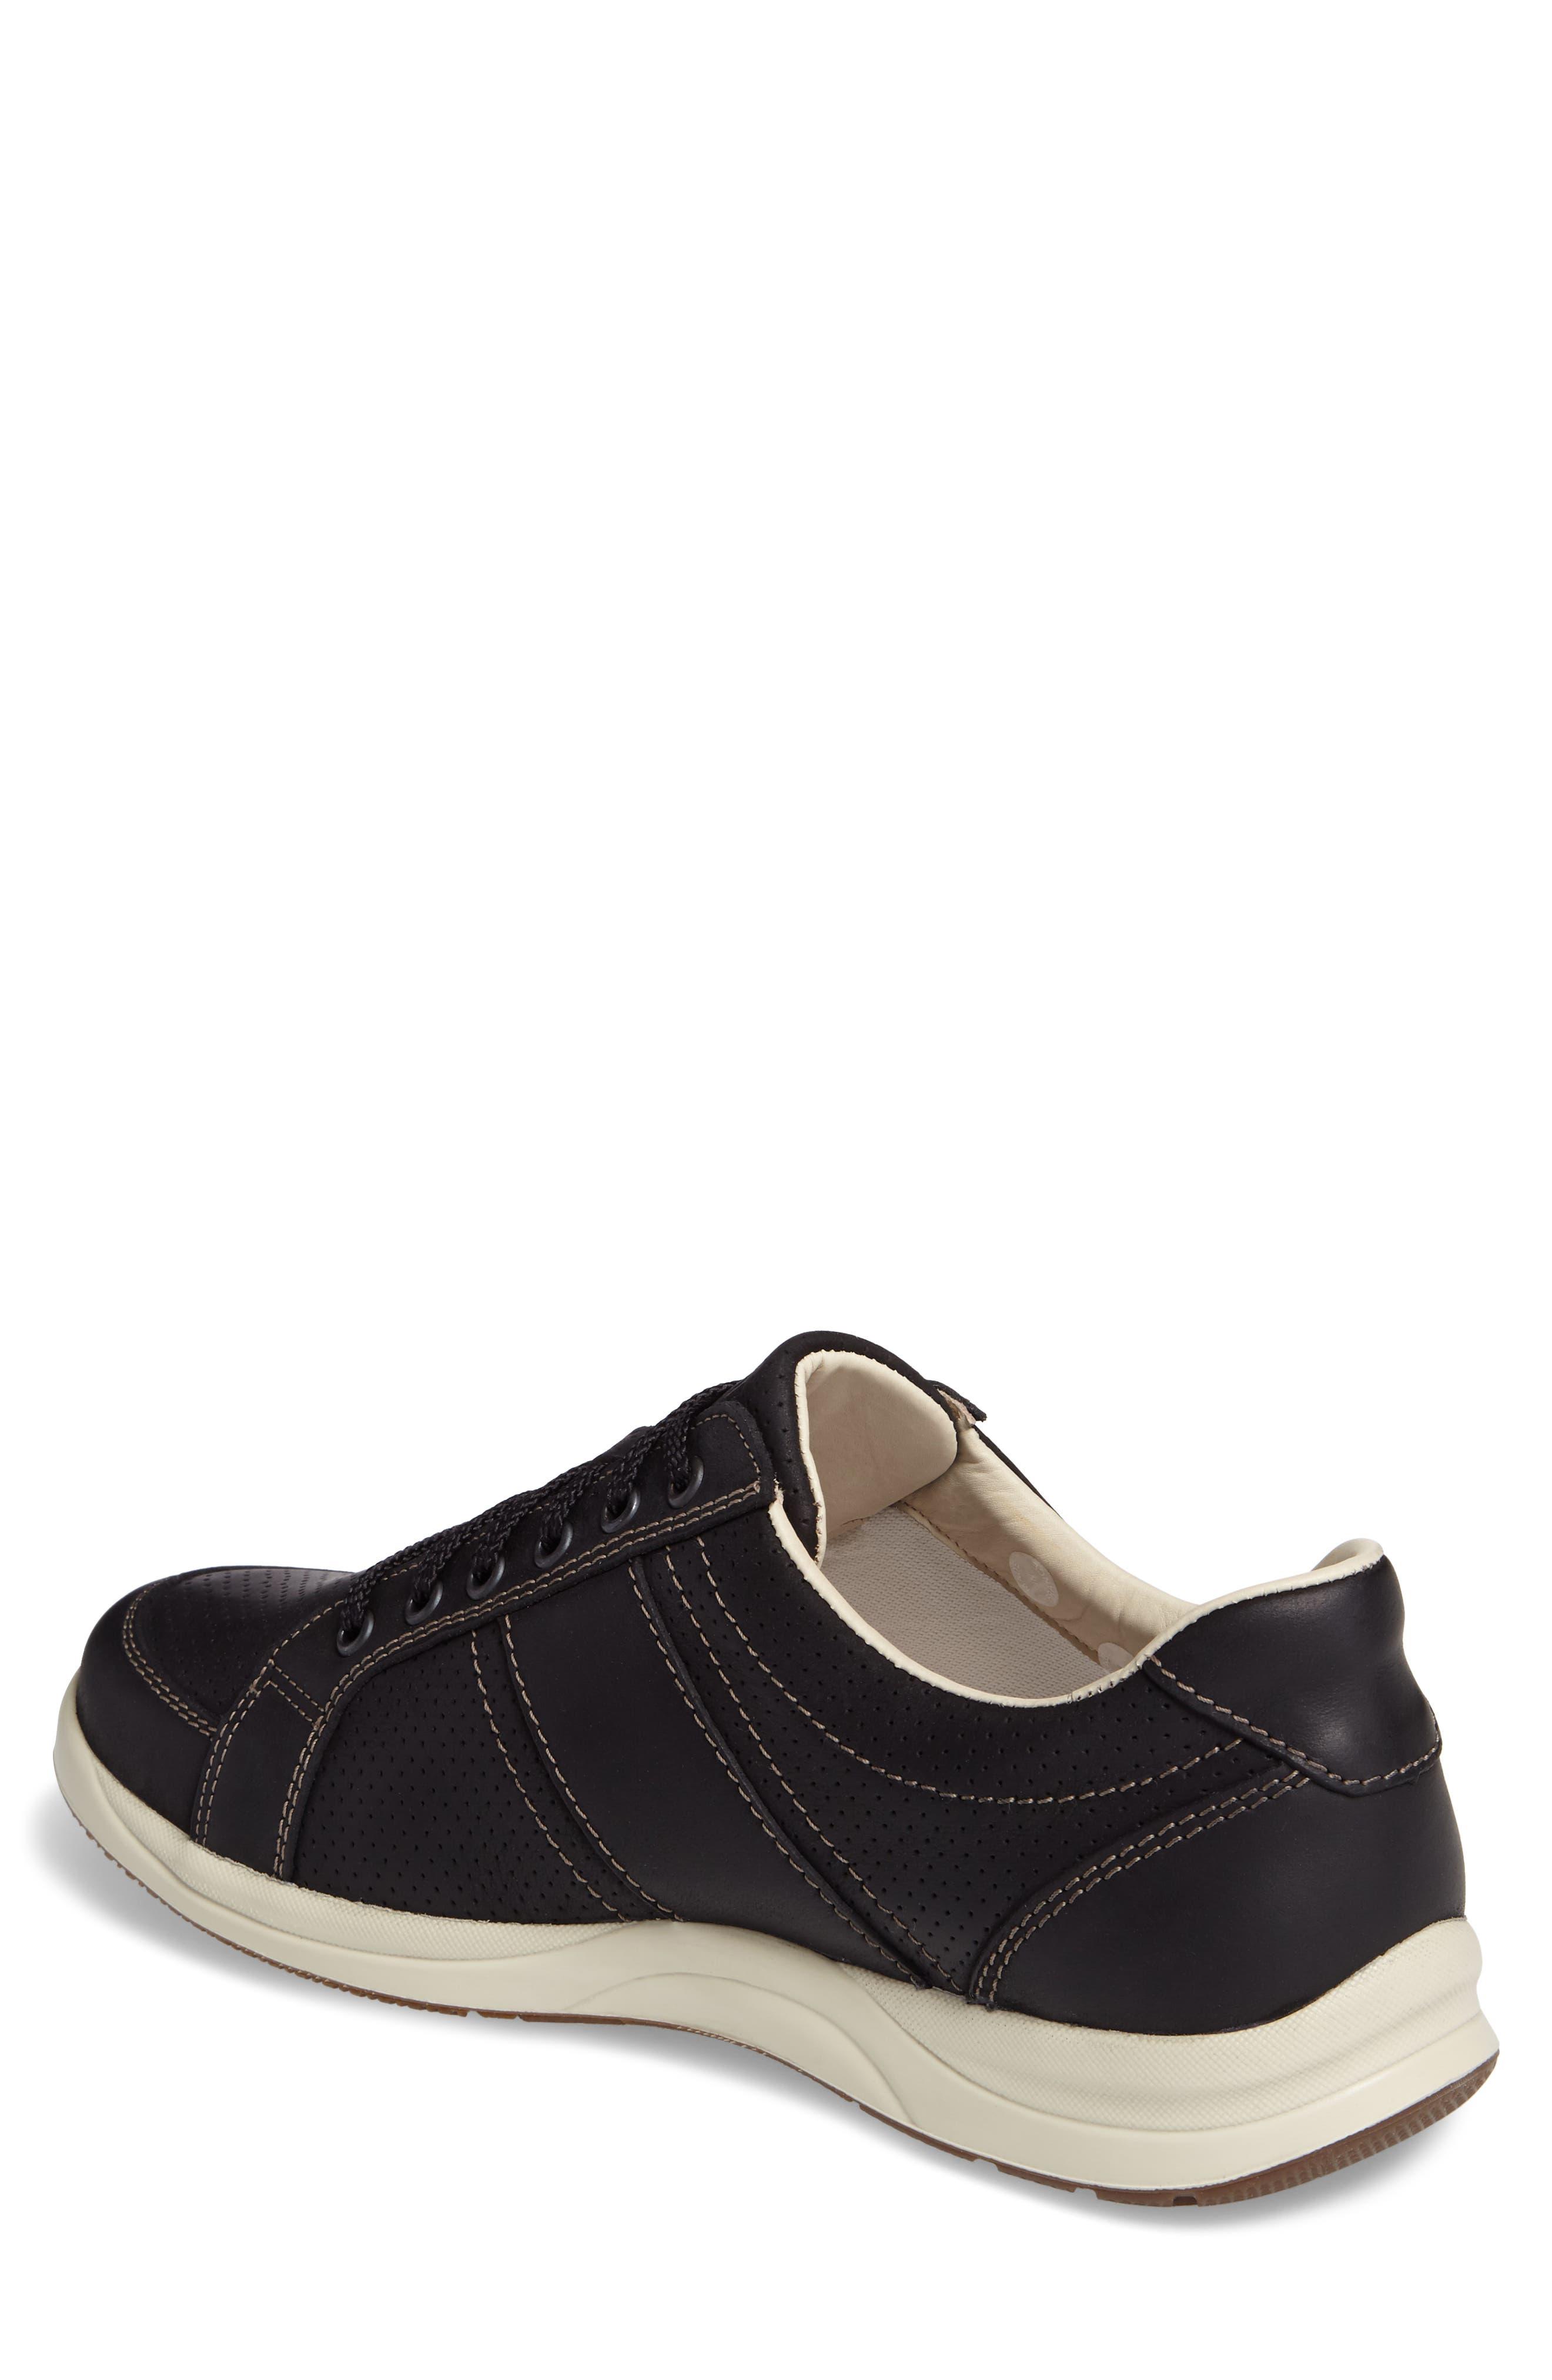 'Hero' Perforated Sneaker,                             Alternate thumbnail 2, color,                             Black Nubuck Leather